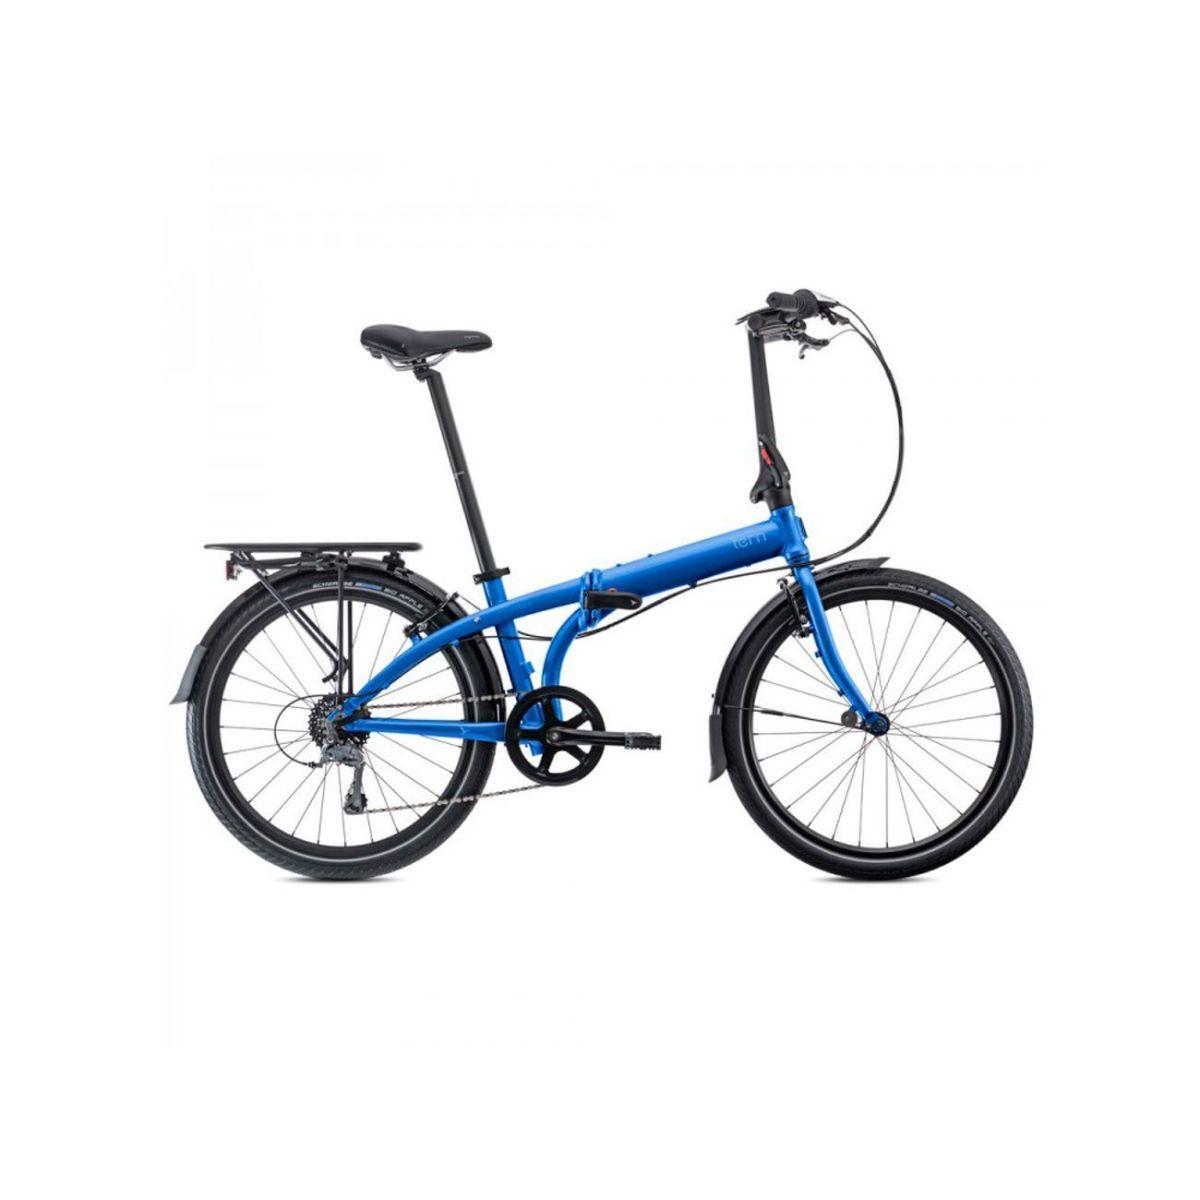 Bicicleta plegable Tern Node D8